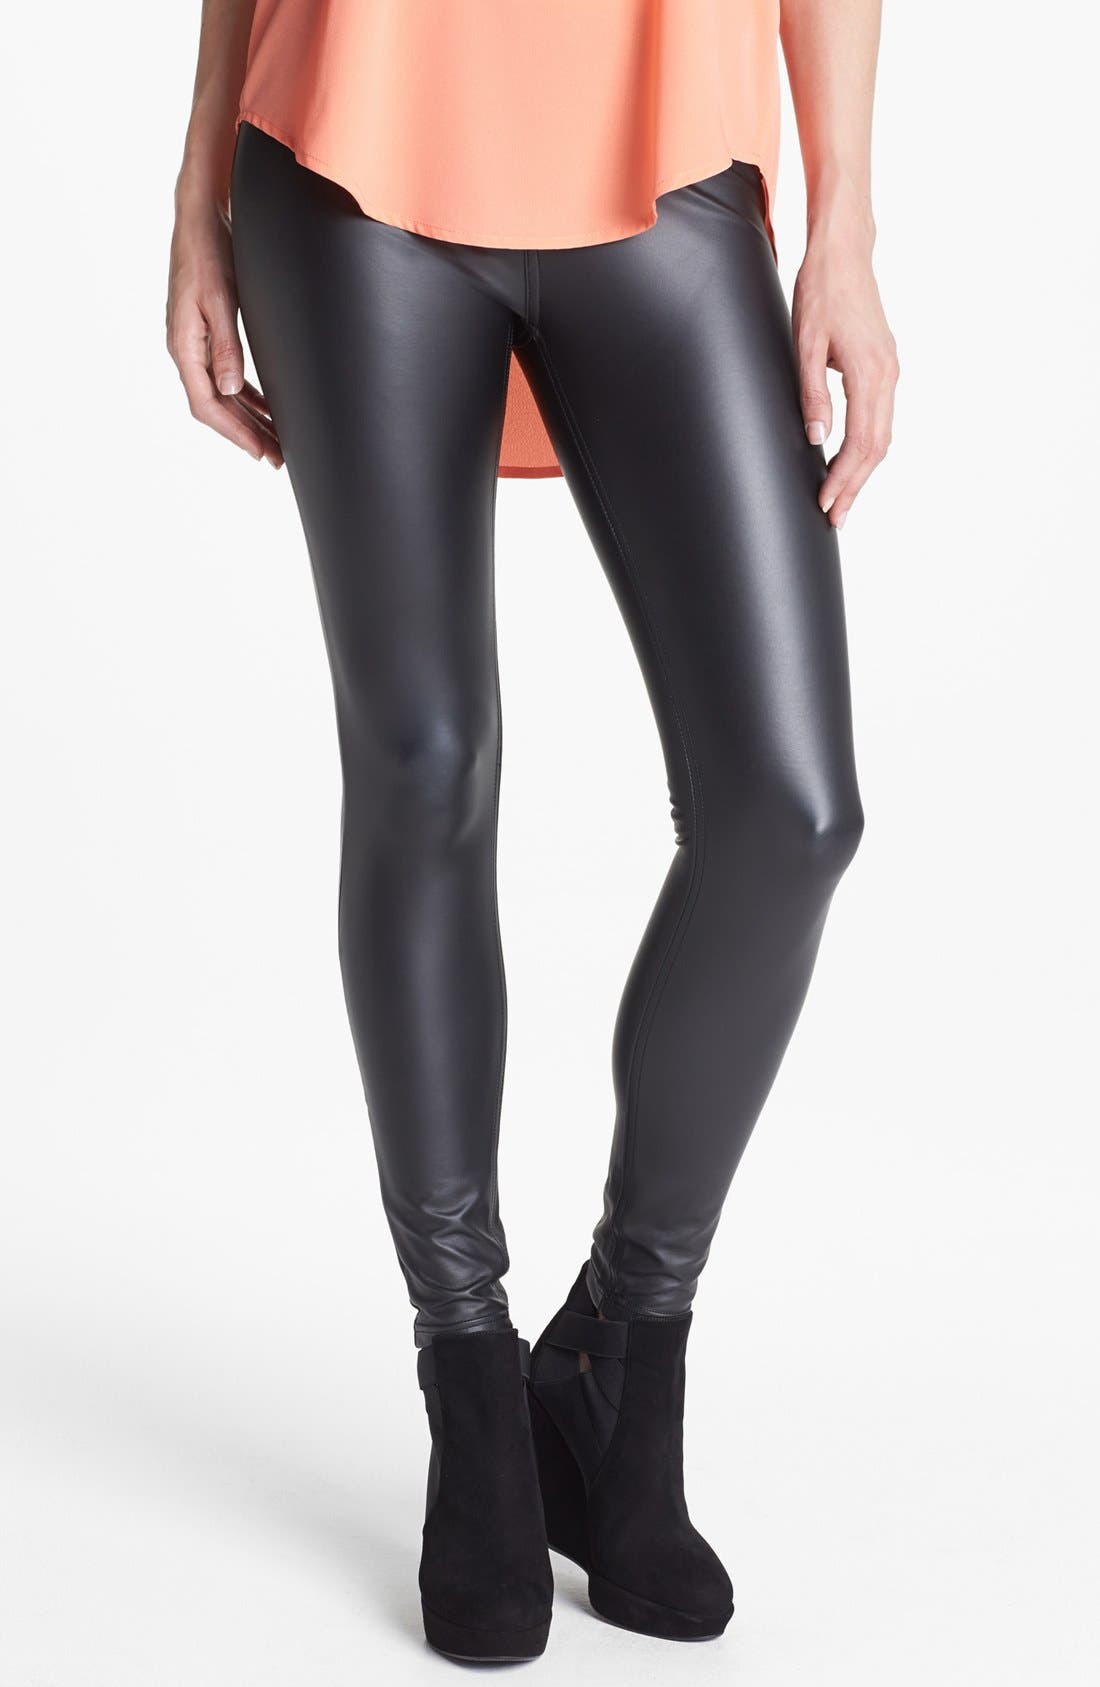 Alternate Image 1 Selected - Hue 'Leatherette' Leggings